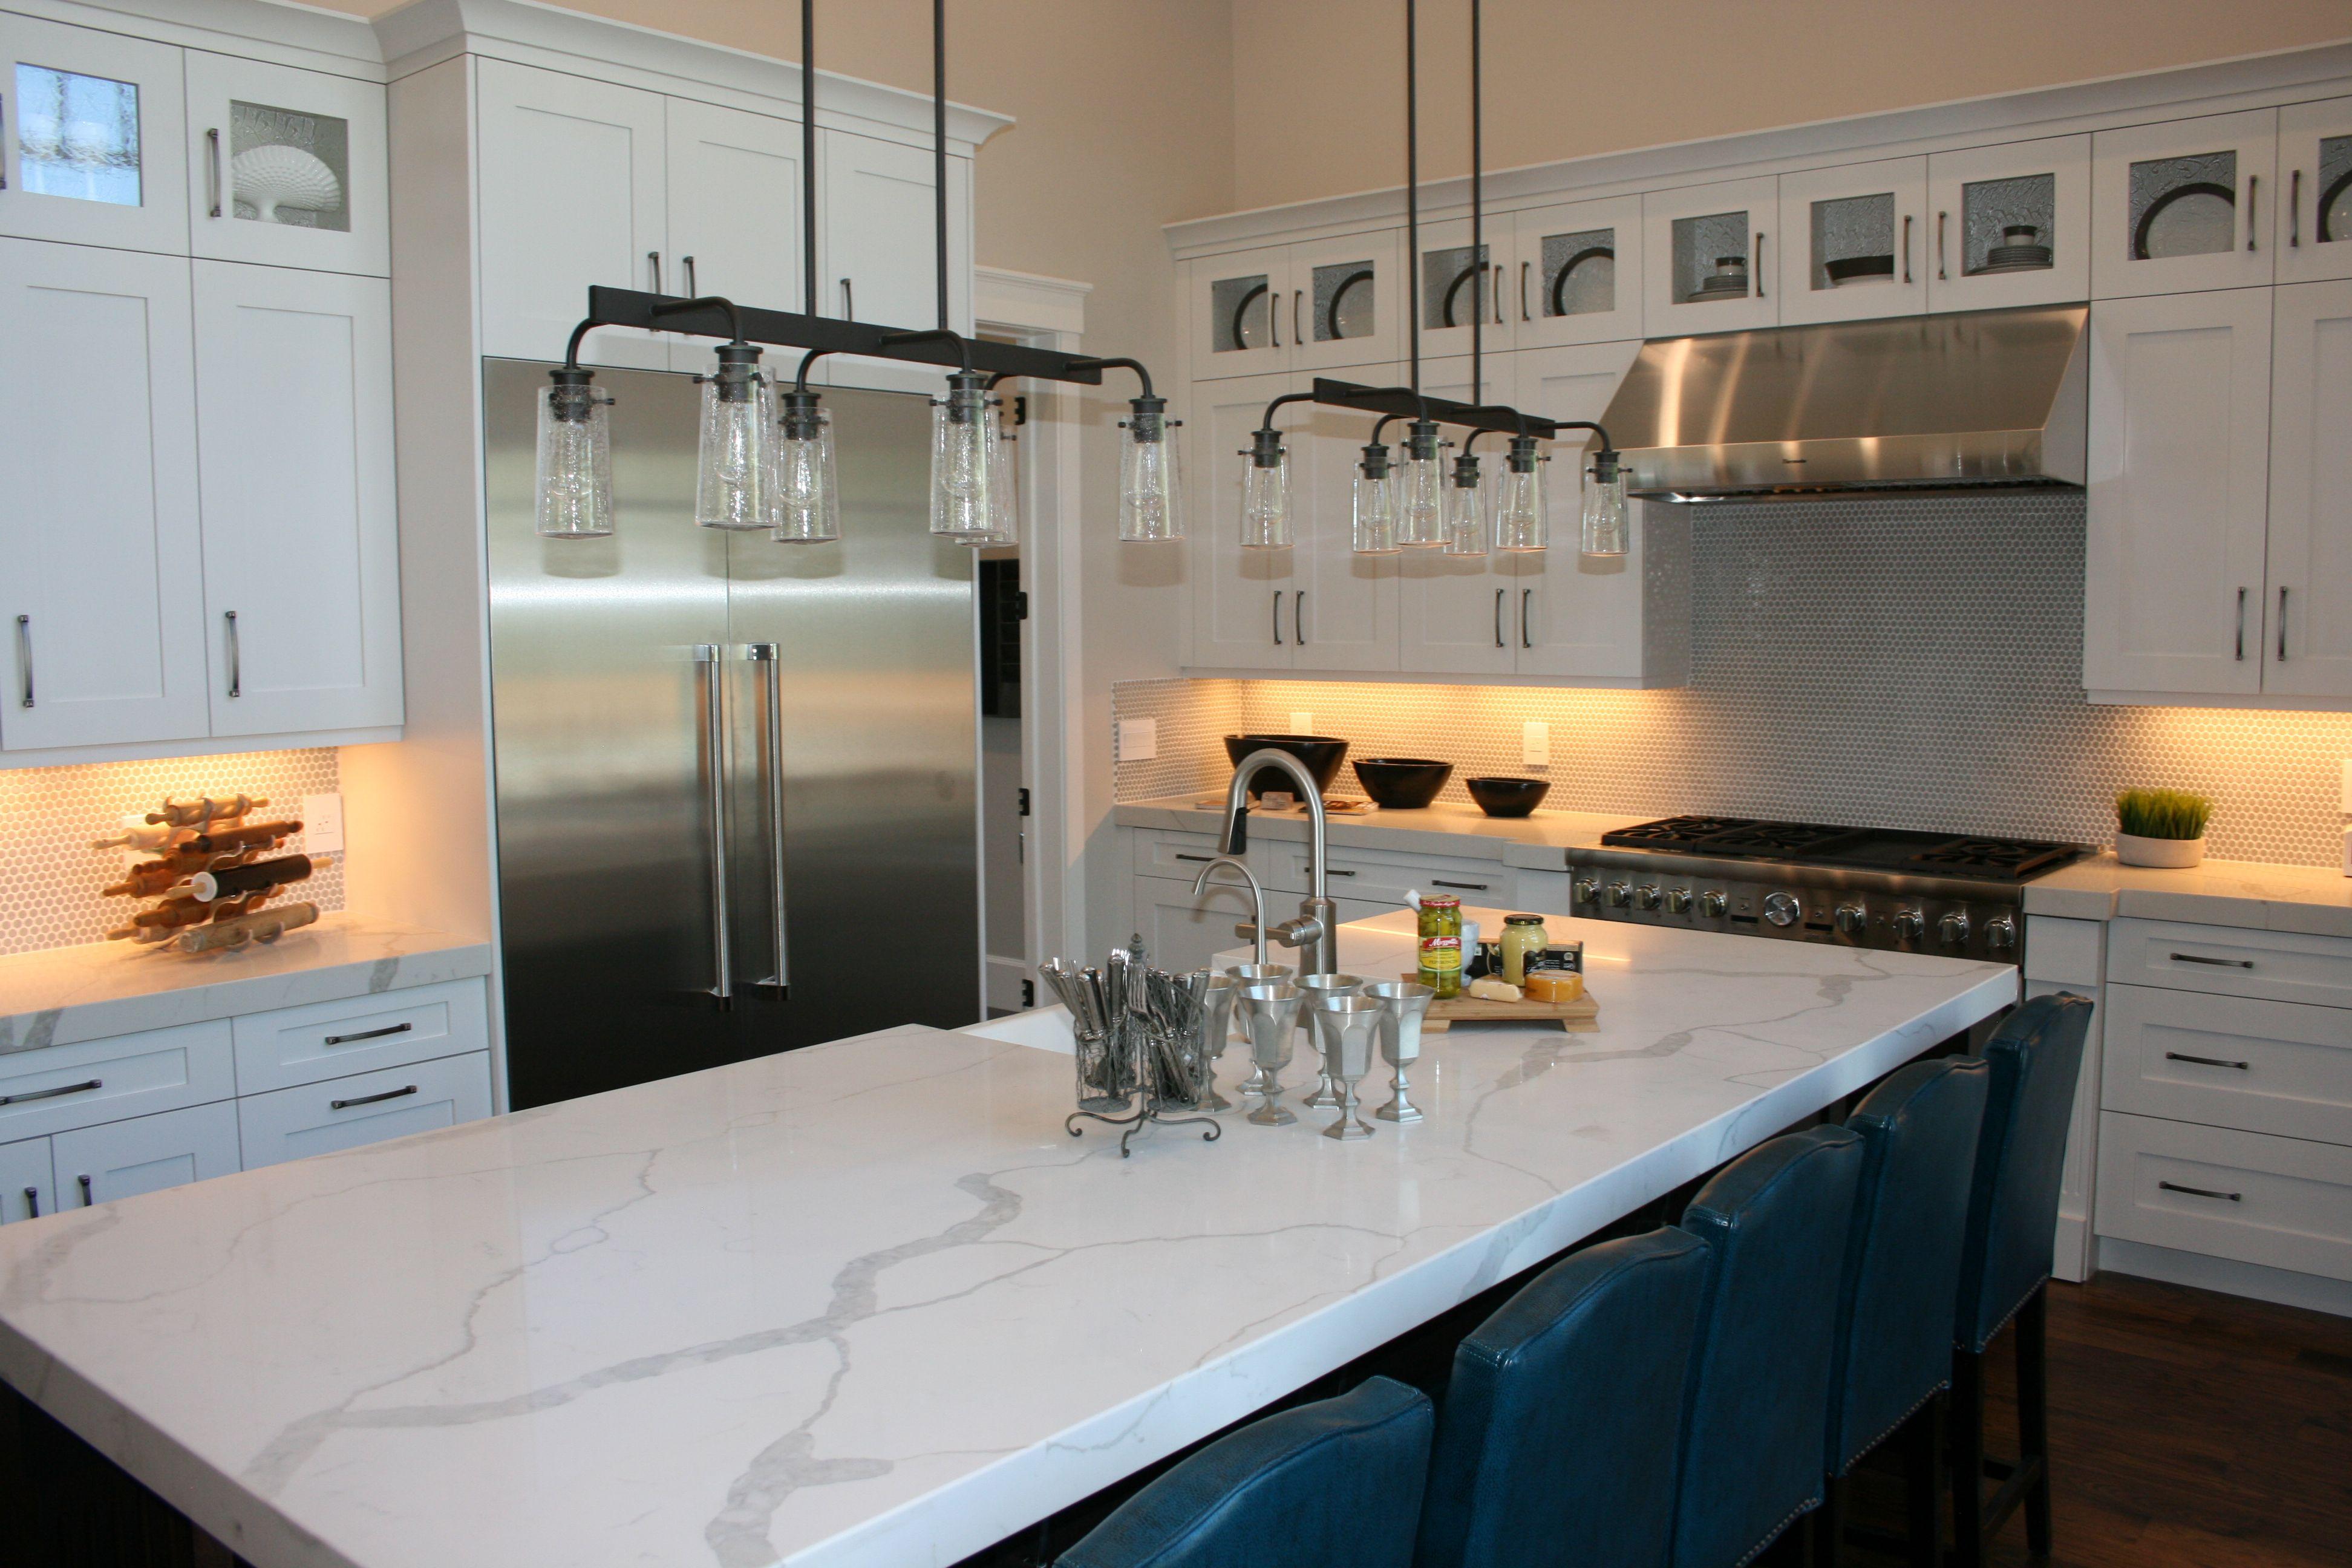 Exemplary Widget Posts Seealso Kitchen Cabinets Custom Wood Kitchen Cabinets Kitchen Wall Cabinets